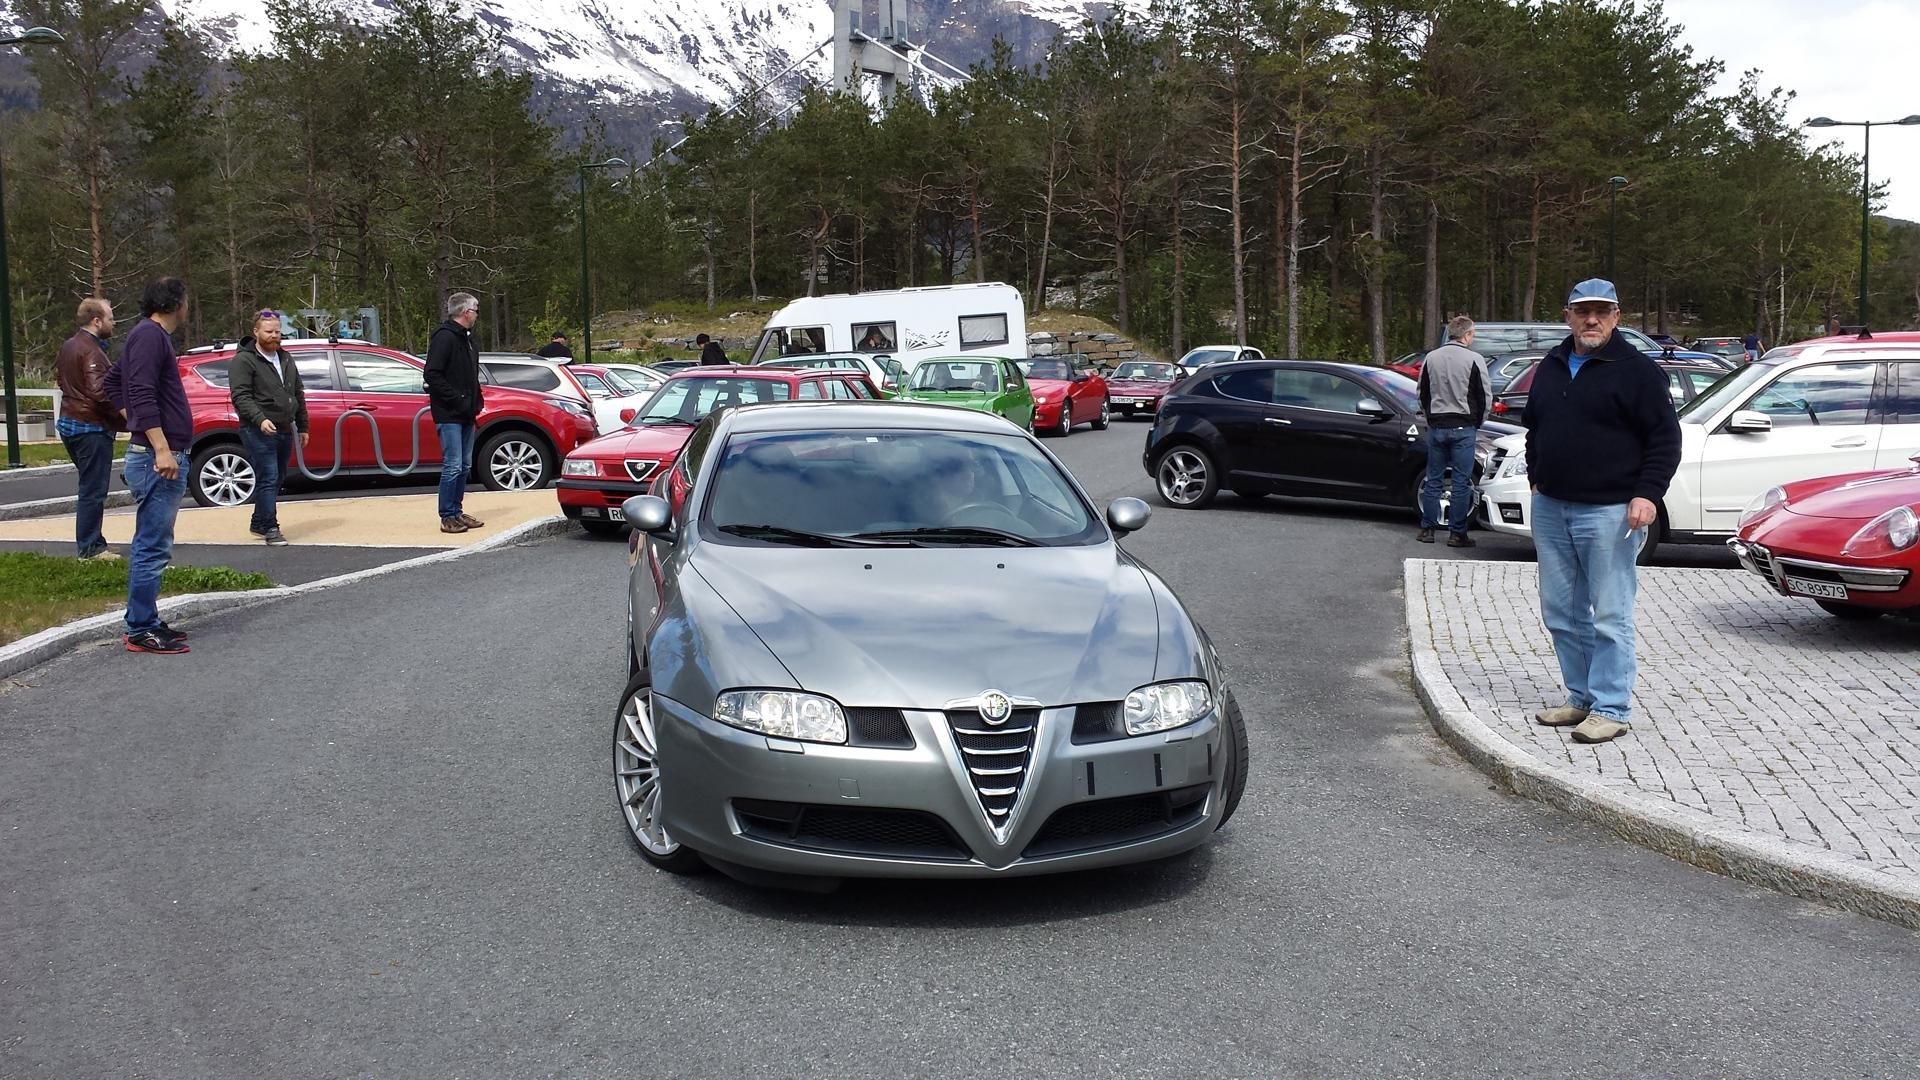 014 Parkering ved Bu KafÇ.jpg